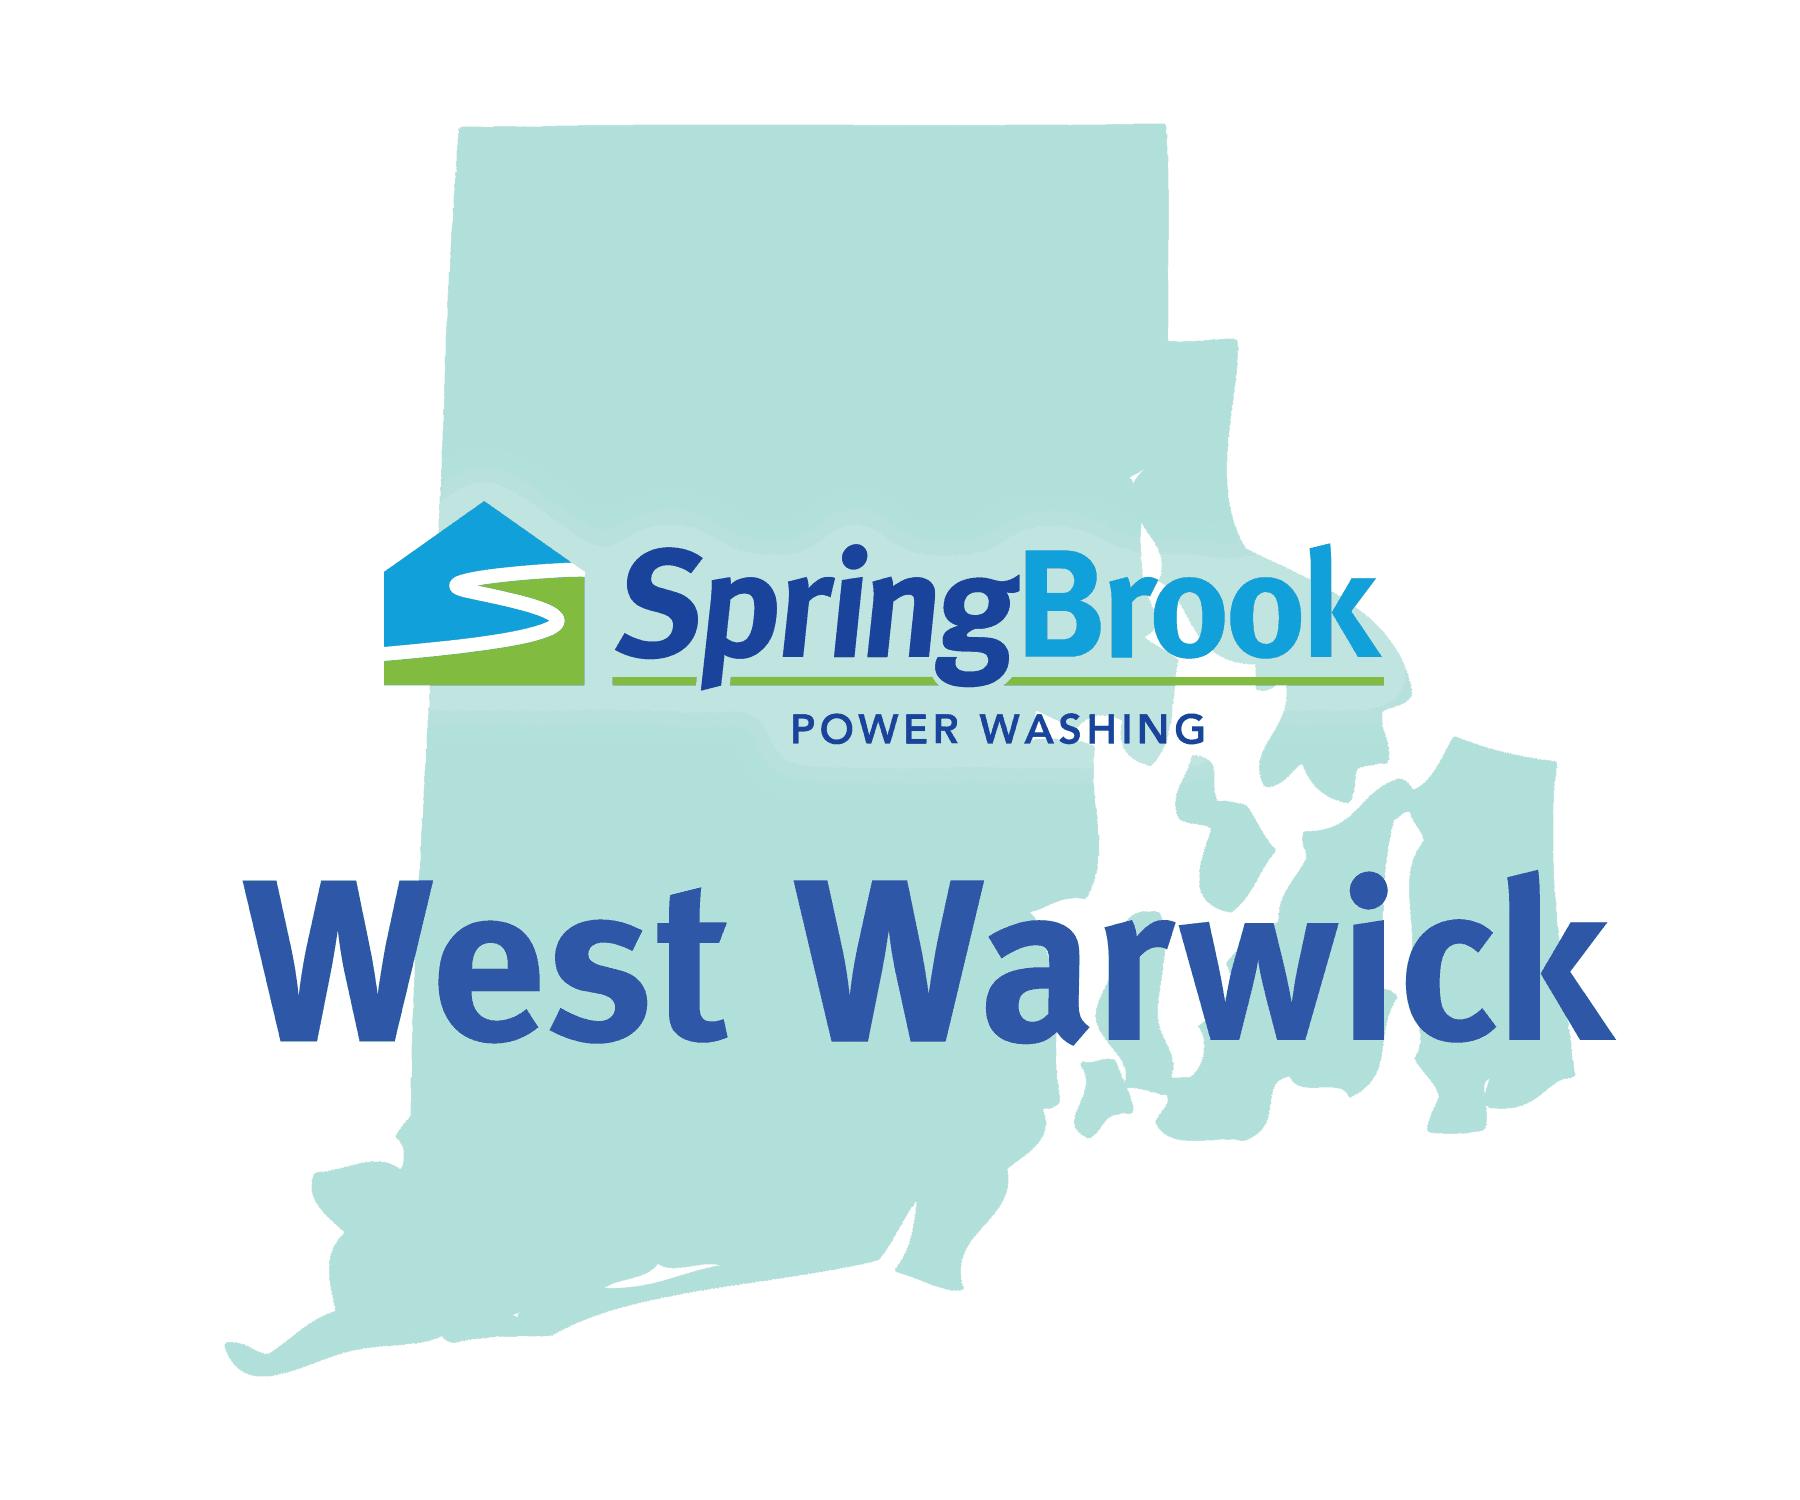 Springbrook Power Washing West Warwick Rhode Island